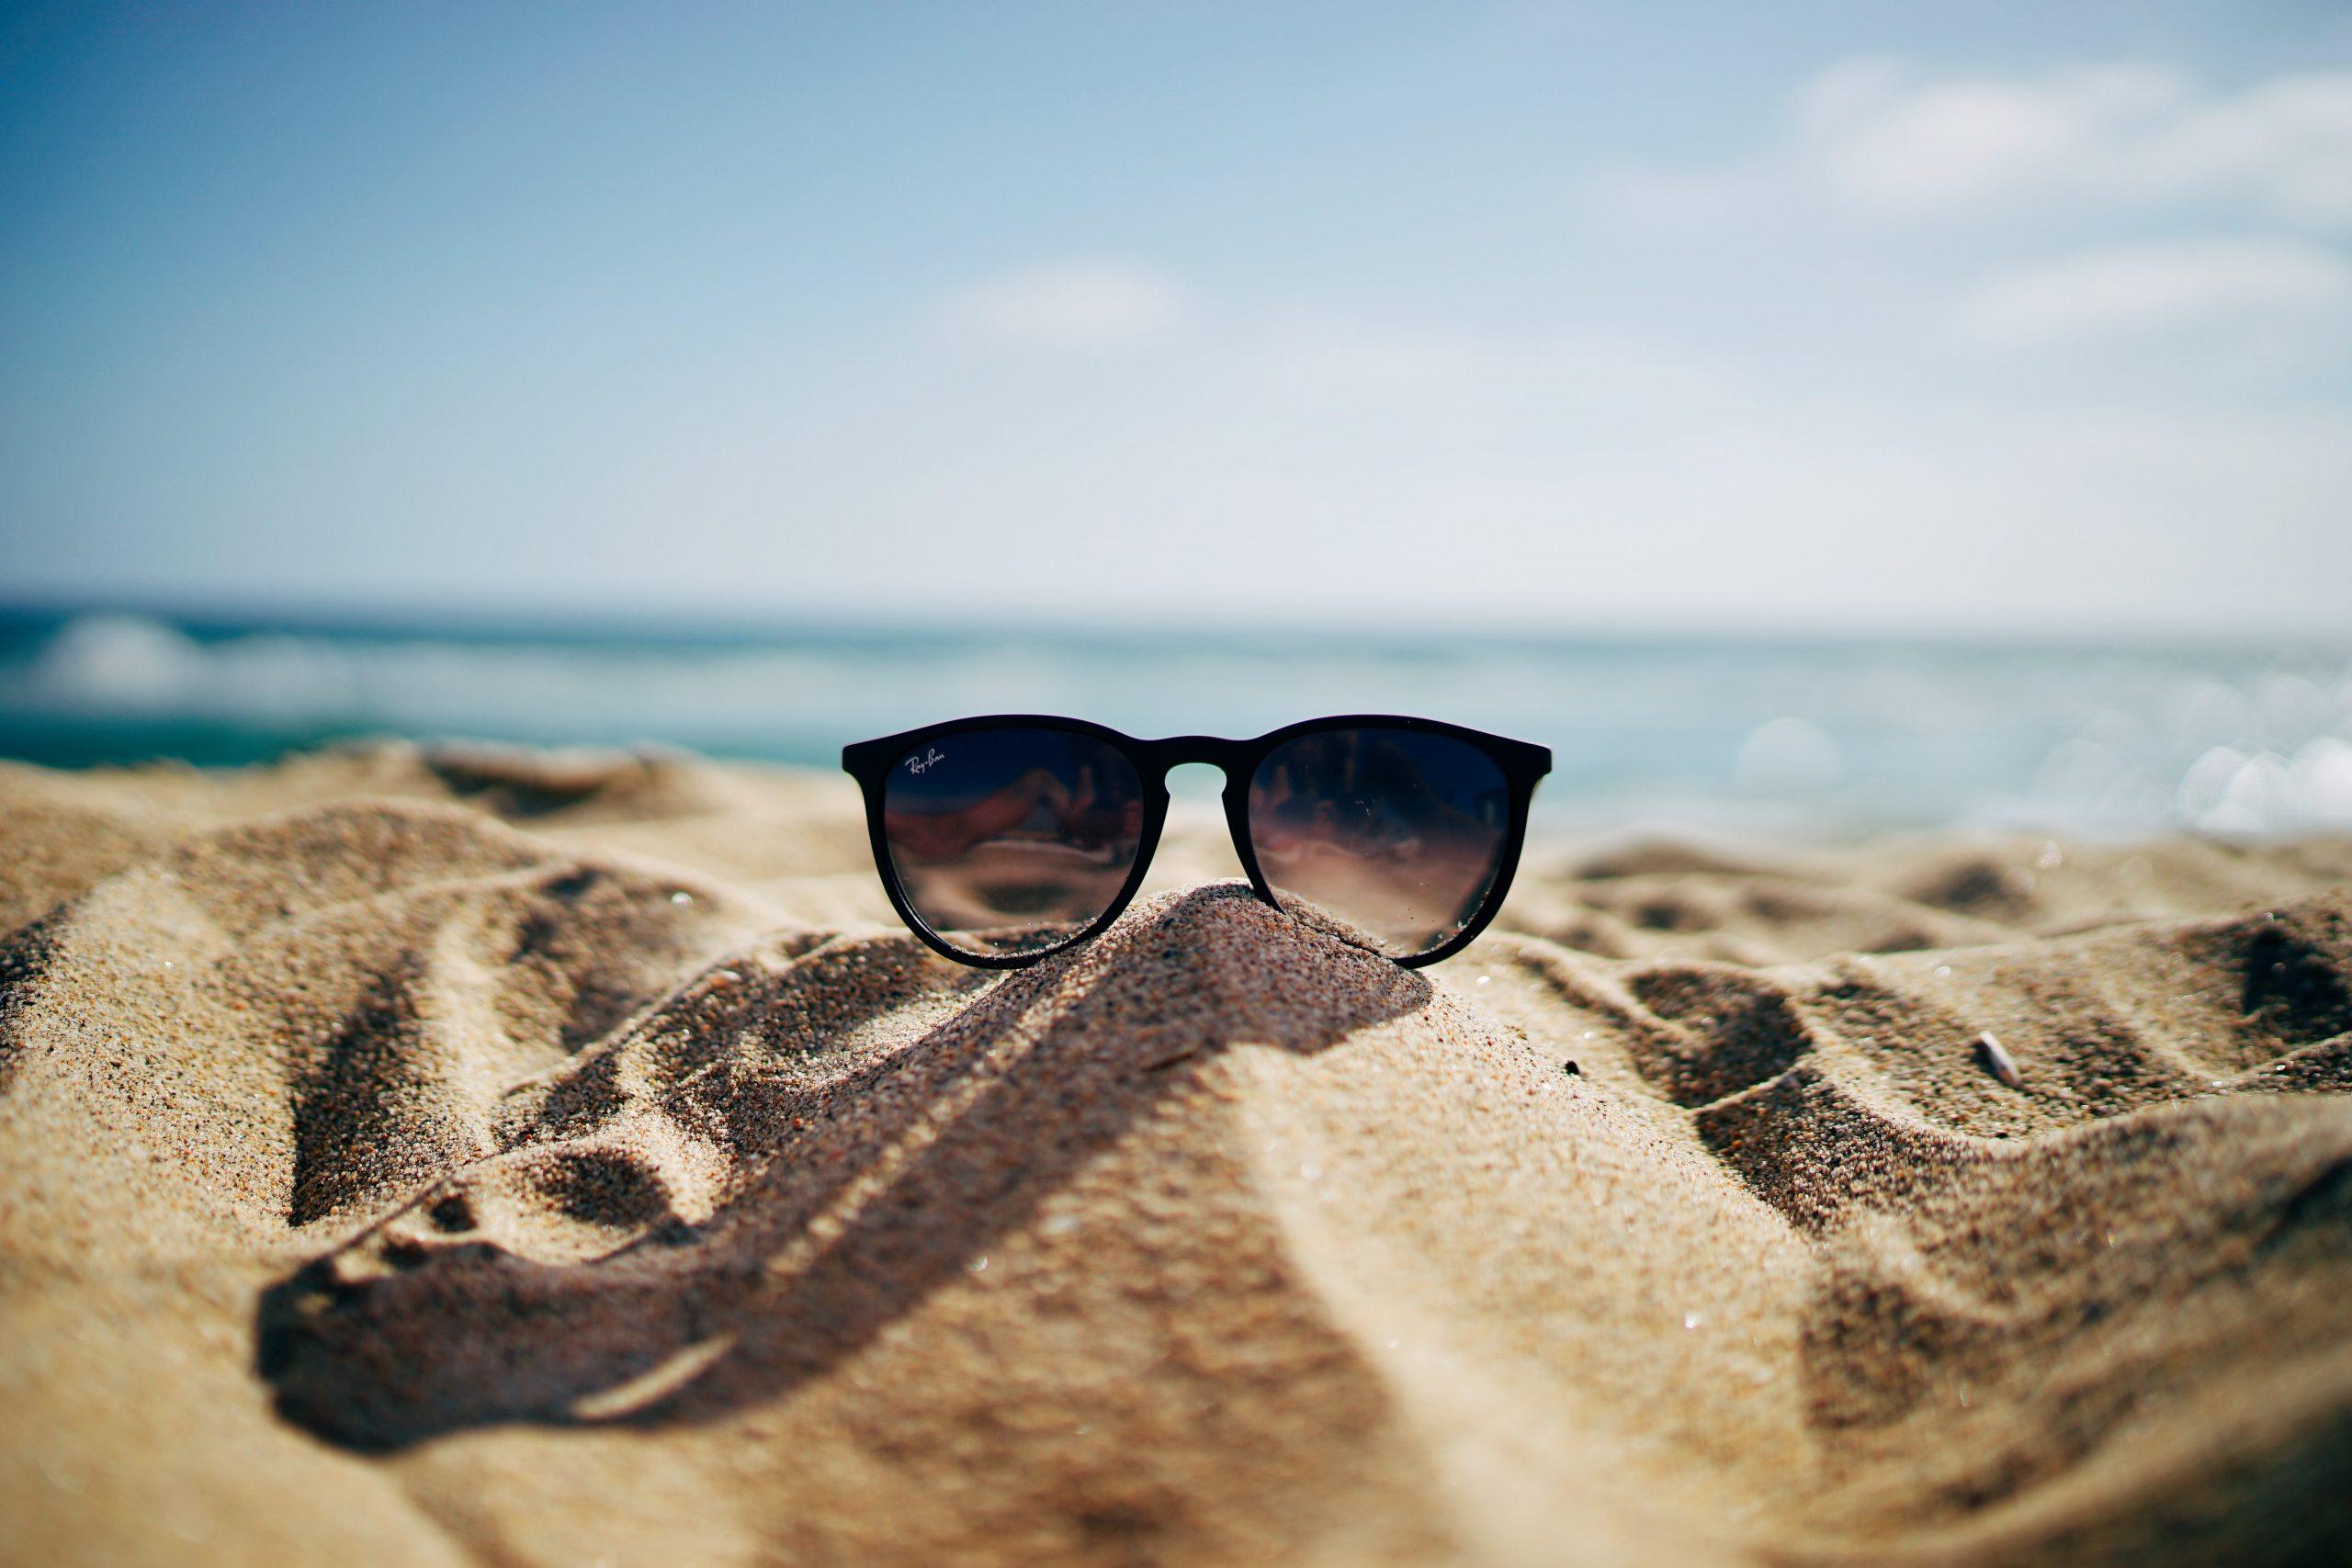 The Advantages of Polarized Sunglasses